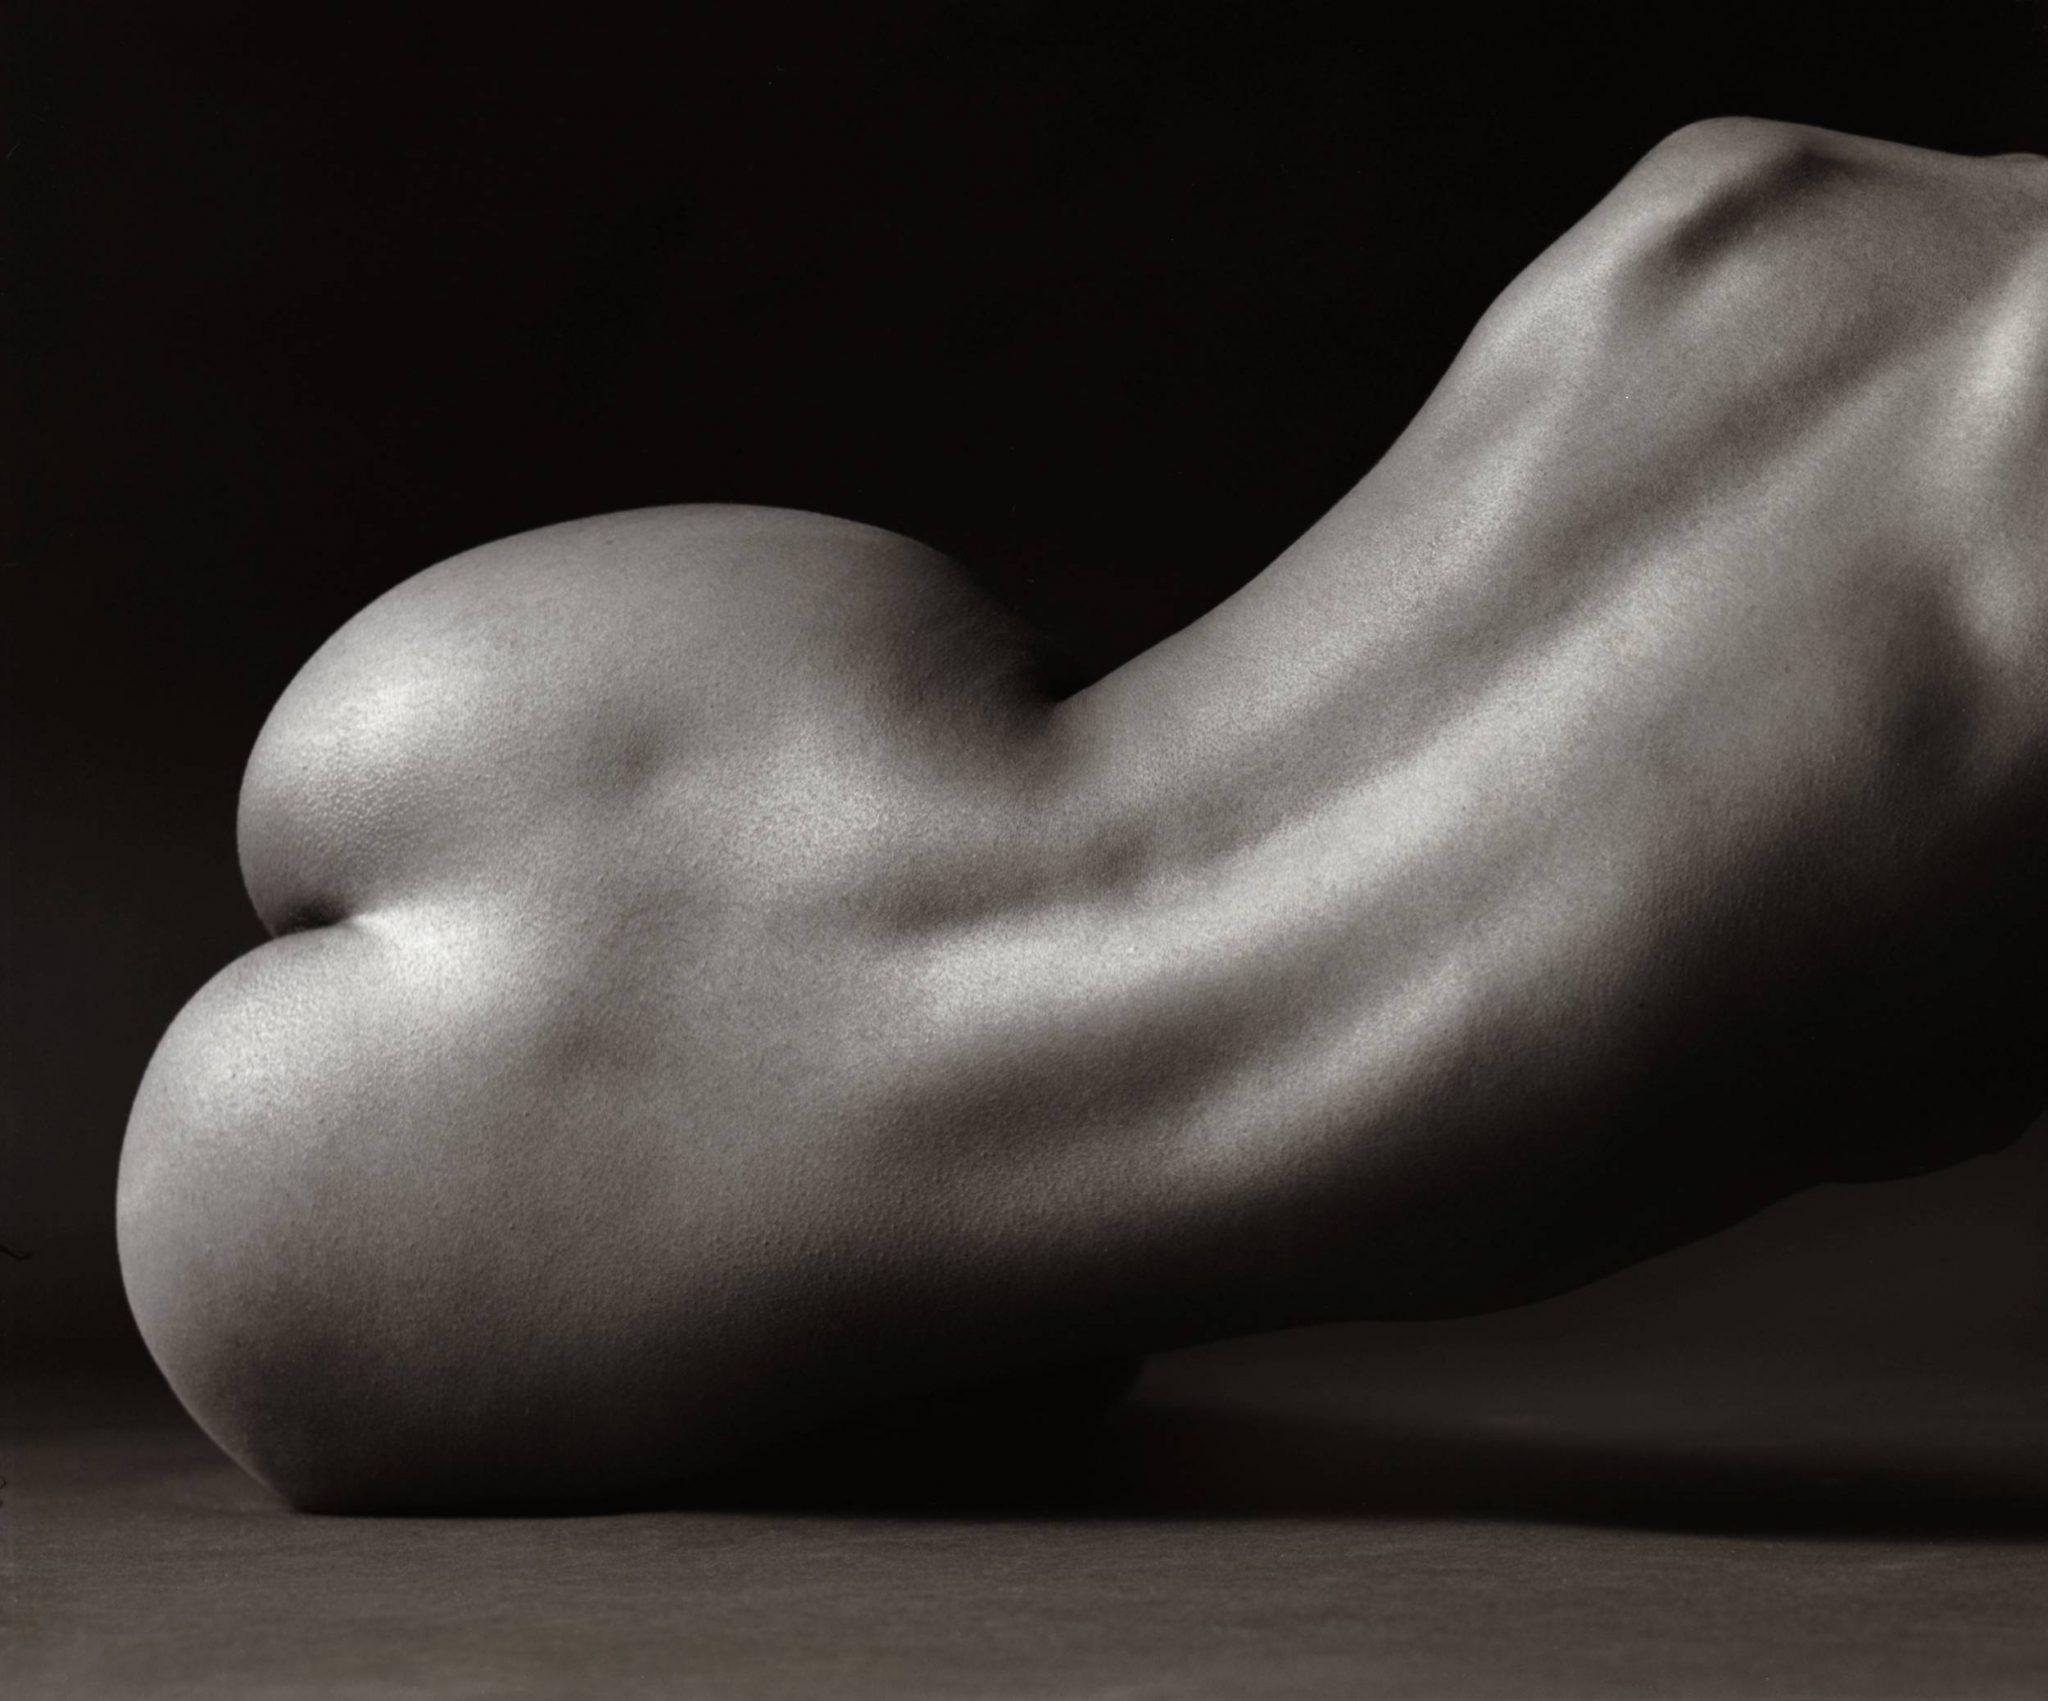 Taller desnudo artístico Leónidas Spinelli Escuela fotografía Mistos Cursos Alicante